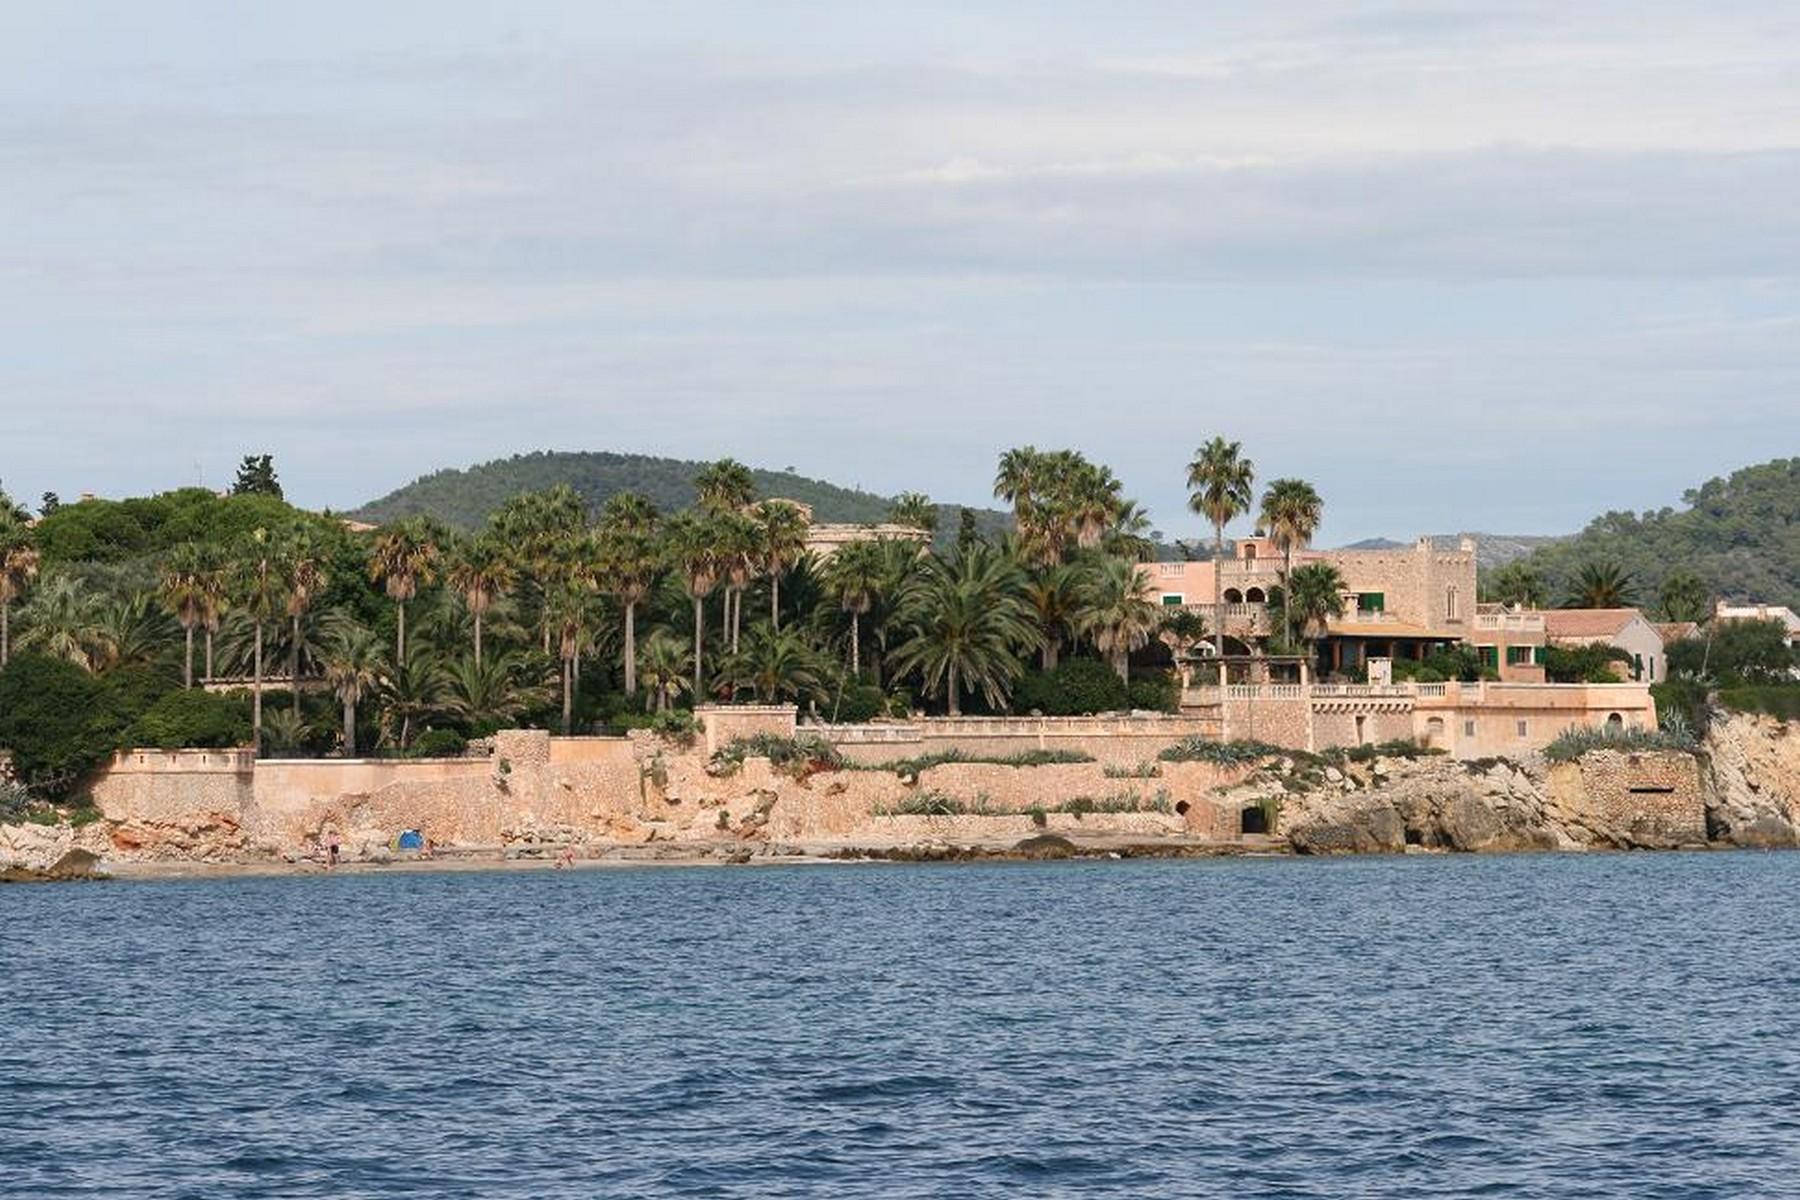 独户住宅 为 销售 在 Seafront Villa in Costa de los Pinos Costa De Los Pinos, 马洛卡, 07559 西班牙